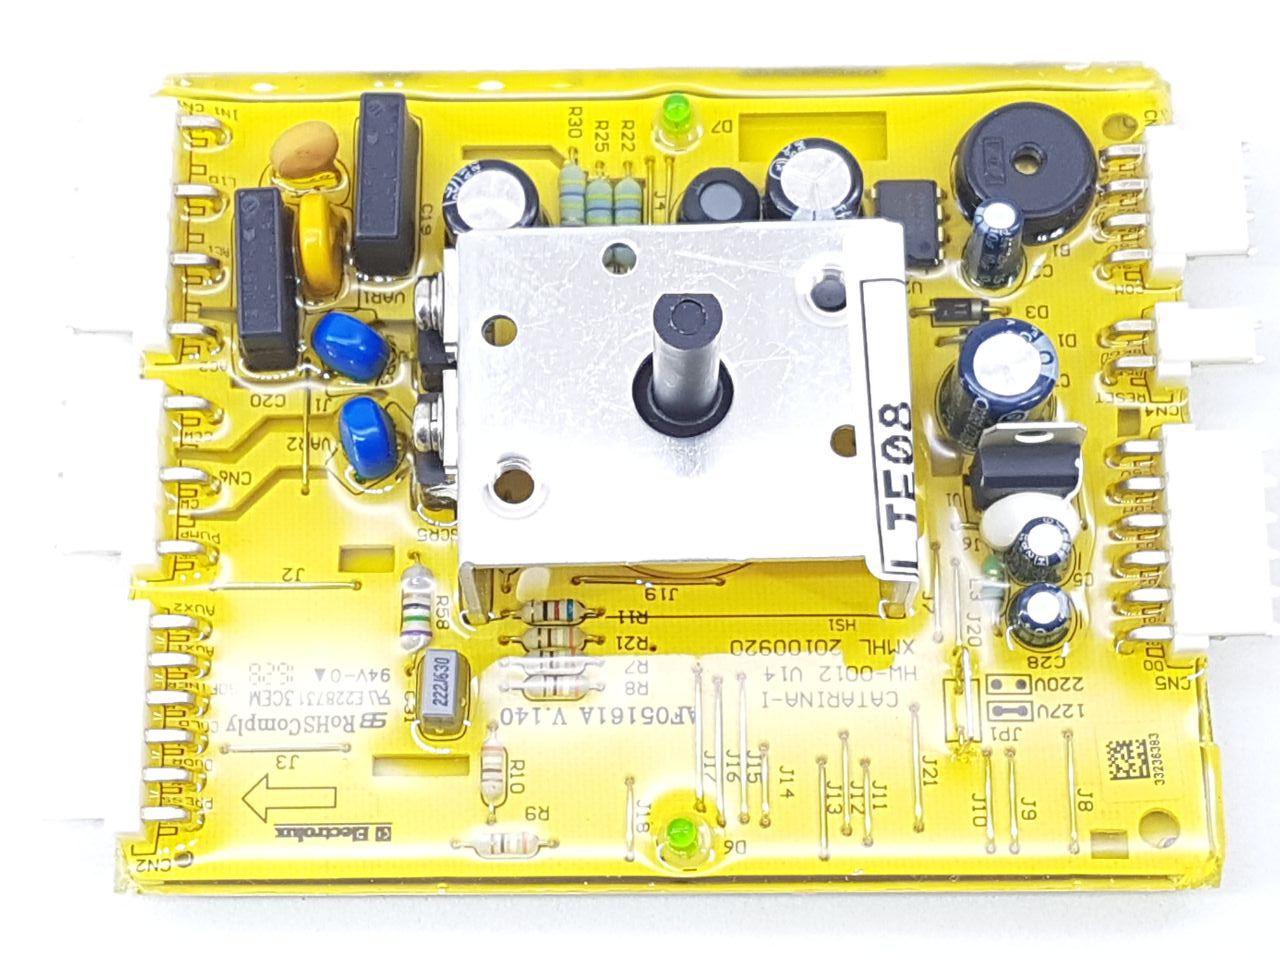 Placa Eletrônica Electrolux Lte08 70200433 Original Bivolt